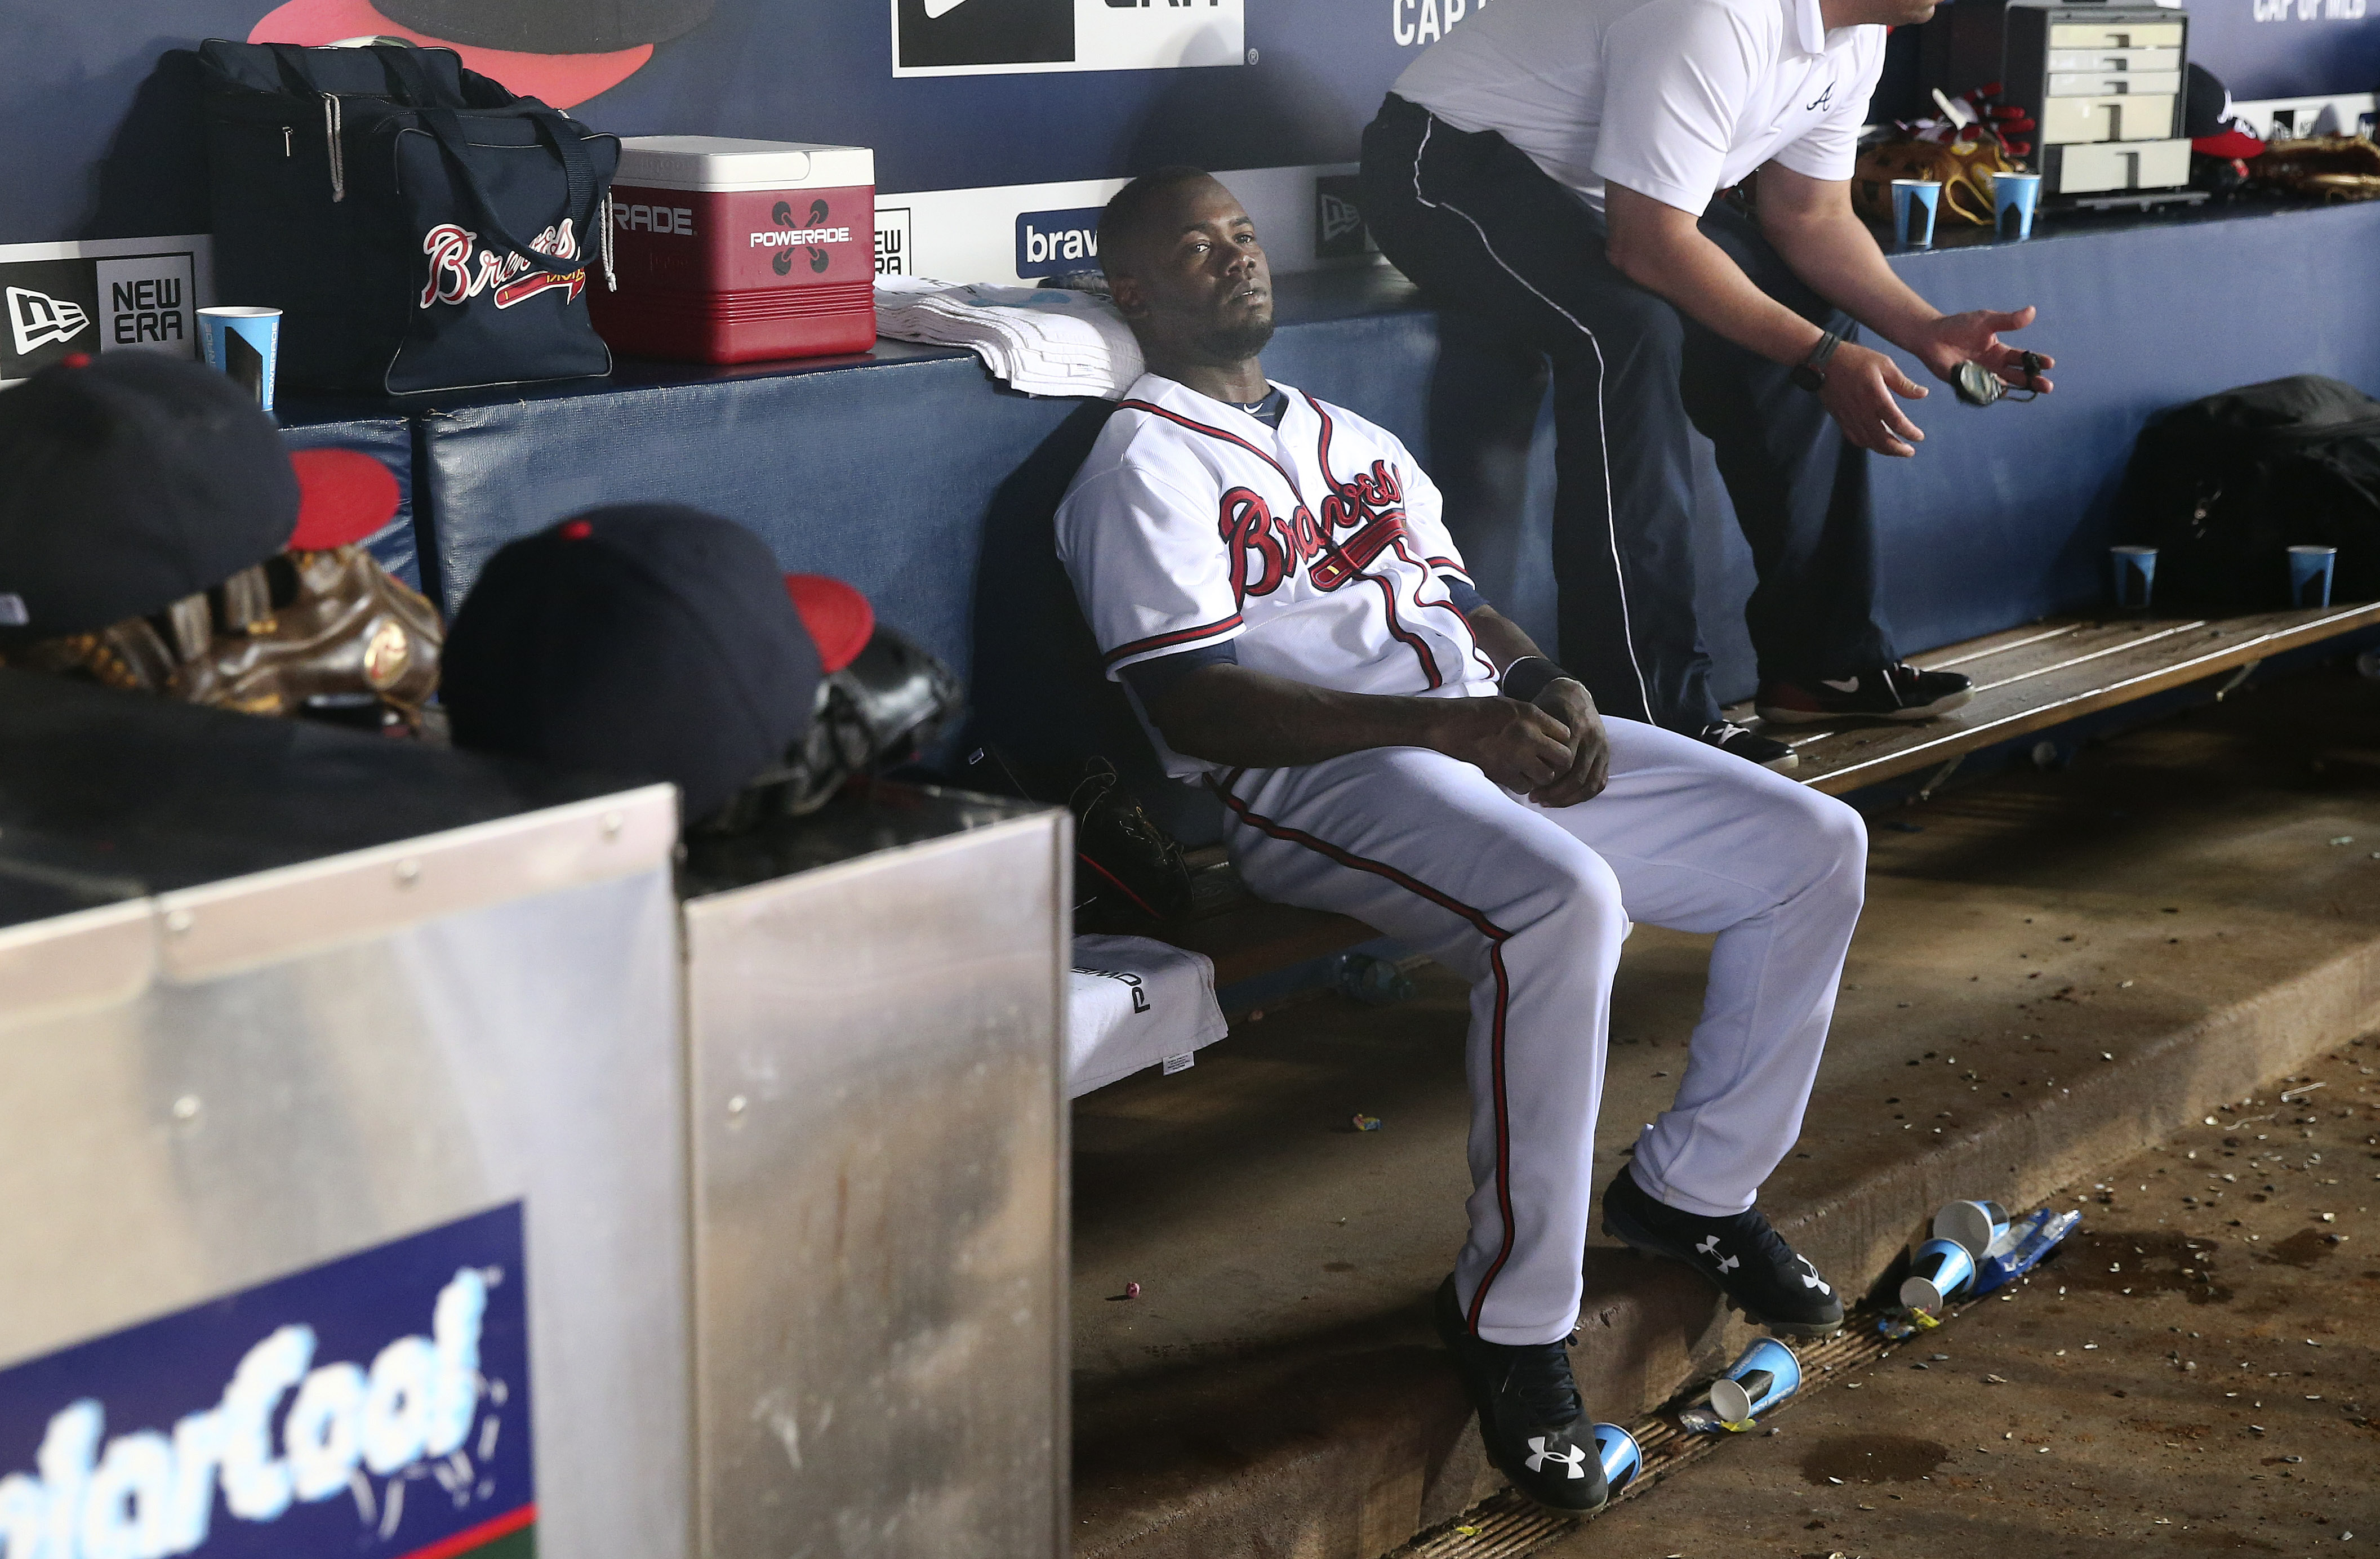 Atlanta Braves third baseman Adonis Garcia sits on the bench in ninth inning of a baseball game against the Colorado Rockies, Tuesday, Aug. 25, 2015, in Atlanta. Colorado won 5-1. (AP Photo/John Bazemore)